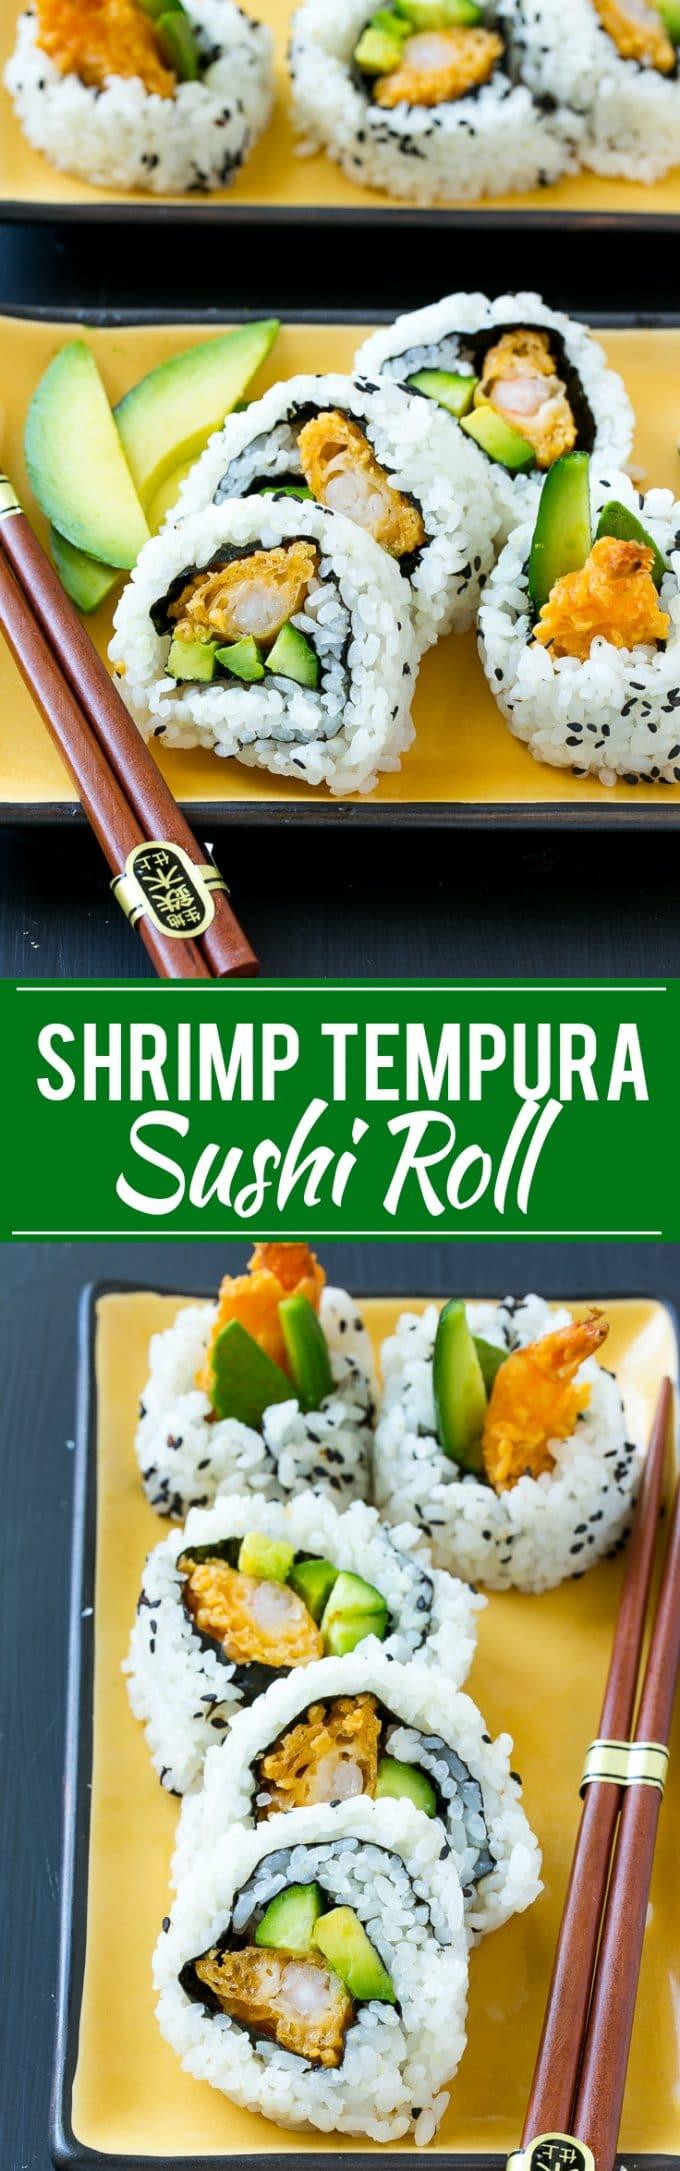 Shrimp Tempura Roll Recipe | Homemade Sushi Recipe | Easy Sushi | Shrimp Tempura | Shrimp Sushi #sushi #tempura #shrimp #dinner #dinneratthezoo